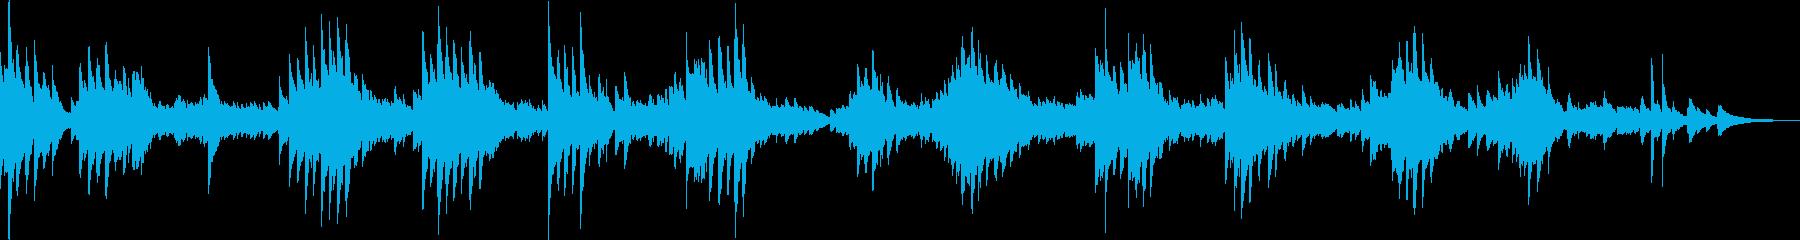 Loss (piano solo, sad, despair, drama accompaniment)'s reproduced waveform